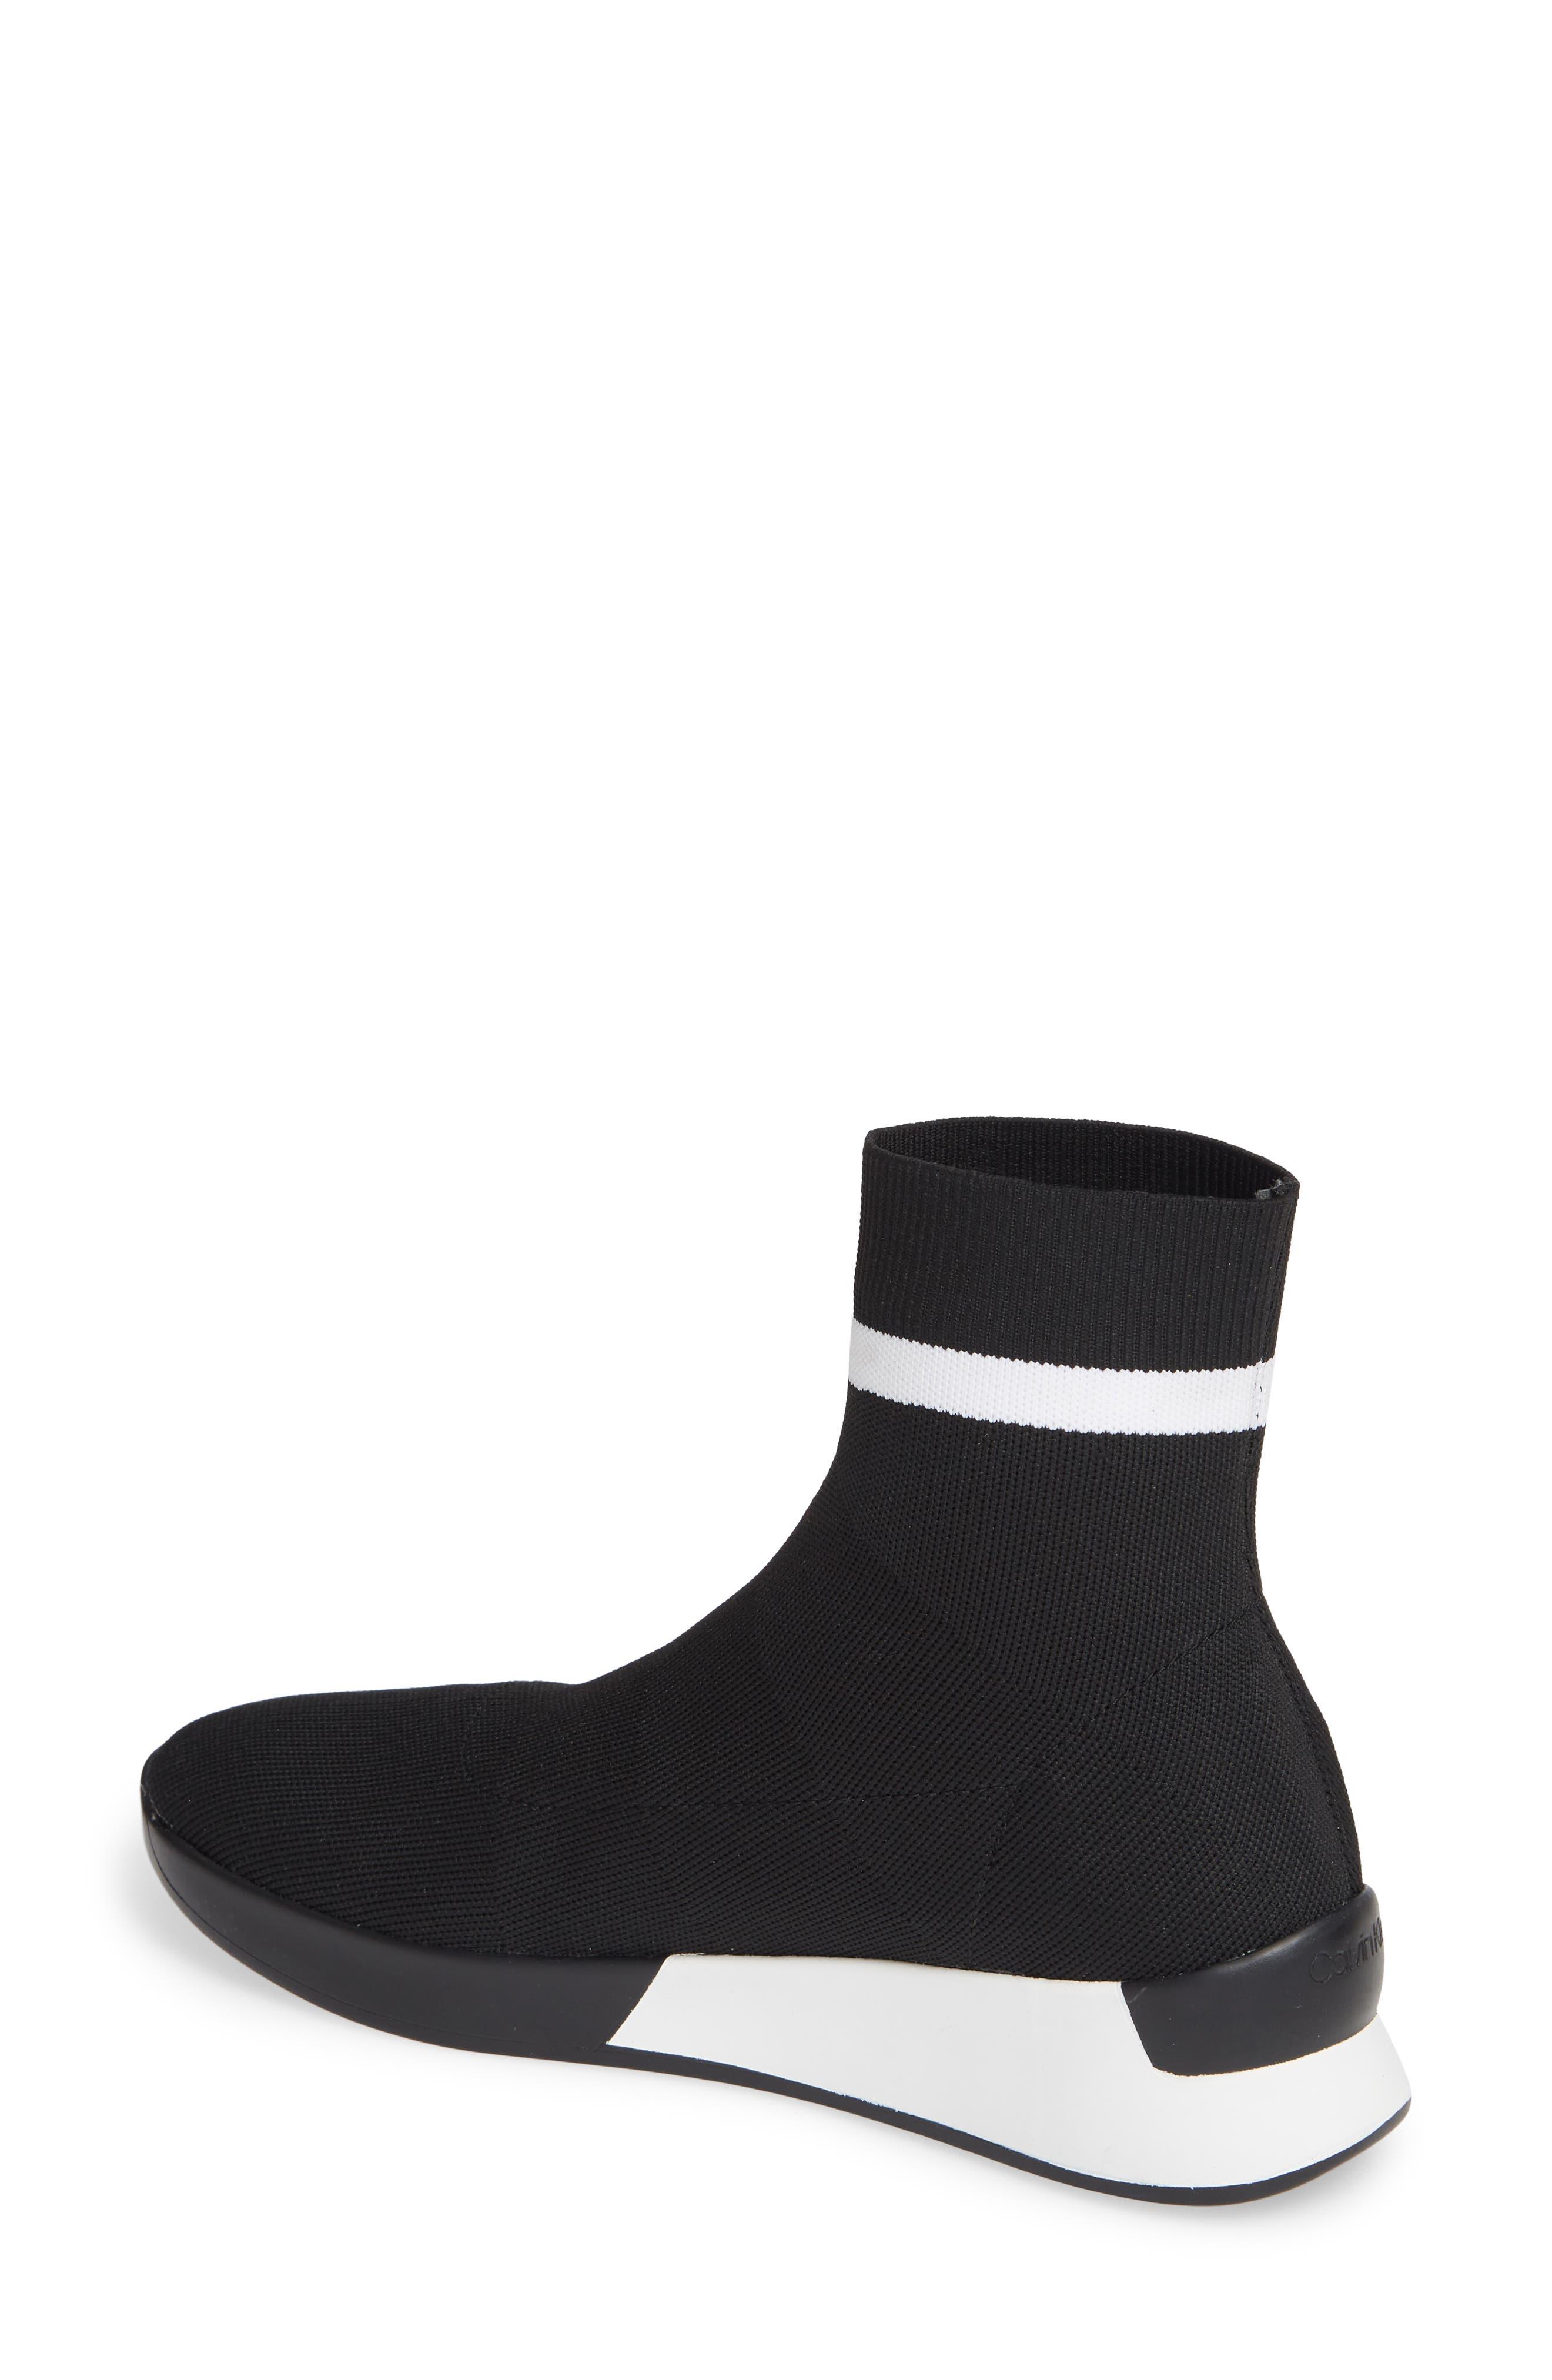 CALVIN KLEIN, Quan Stretch Knit Sneaker, Alternate thumbnail 2, color, BLACK/ WHITE FABRIC